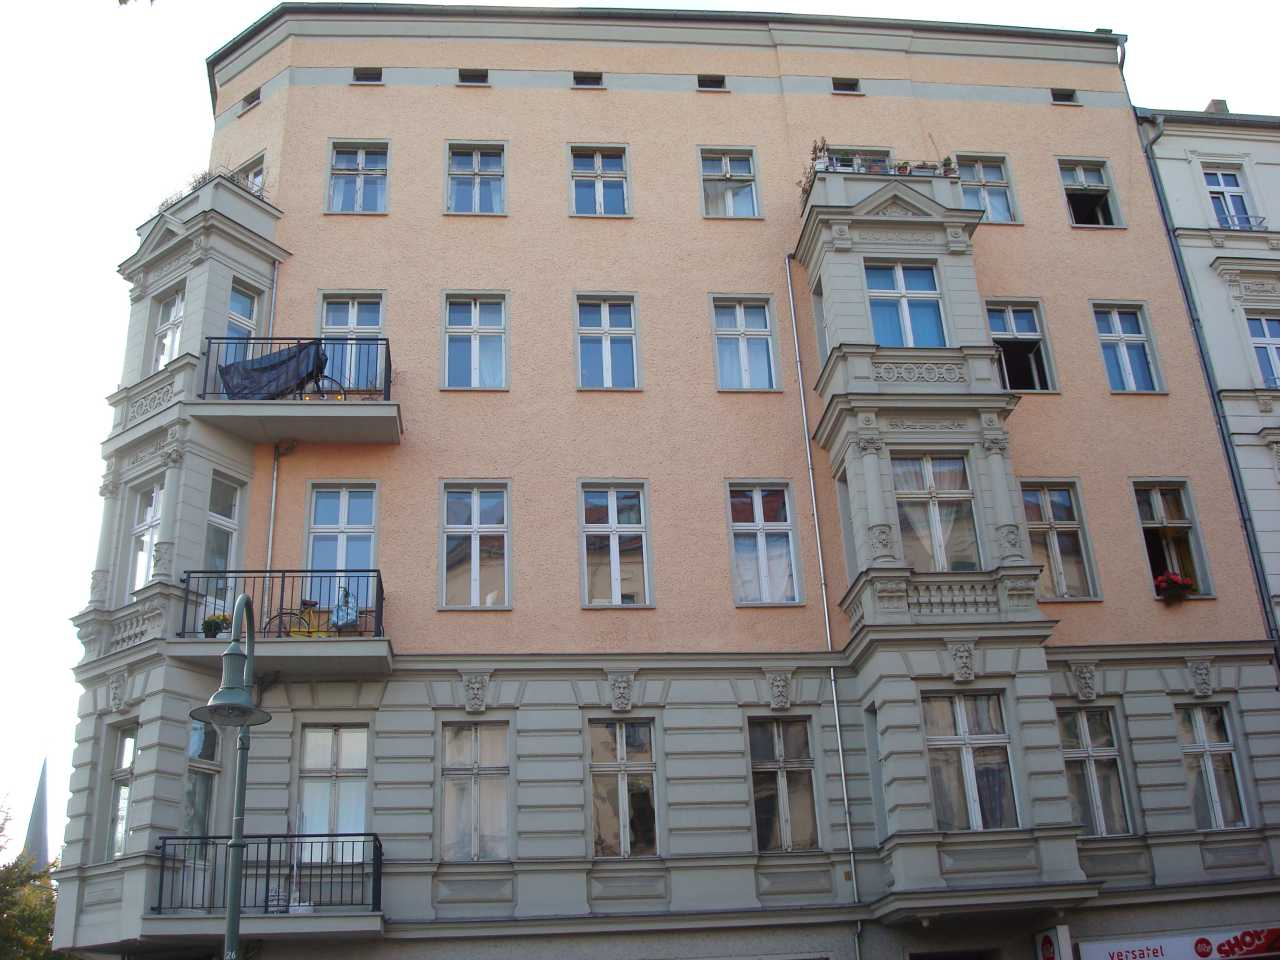 prenzlauer berg galerie berlin architectura pro homine. Black Bedroom Furniture Sets. Home Design Ideas